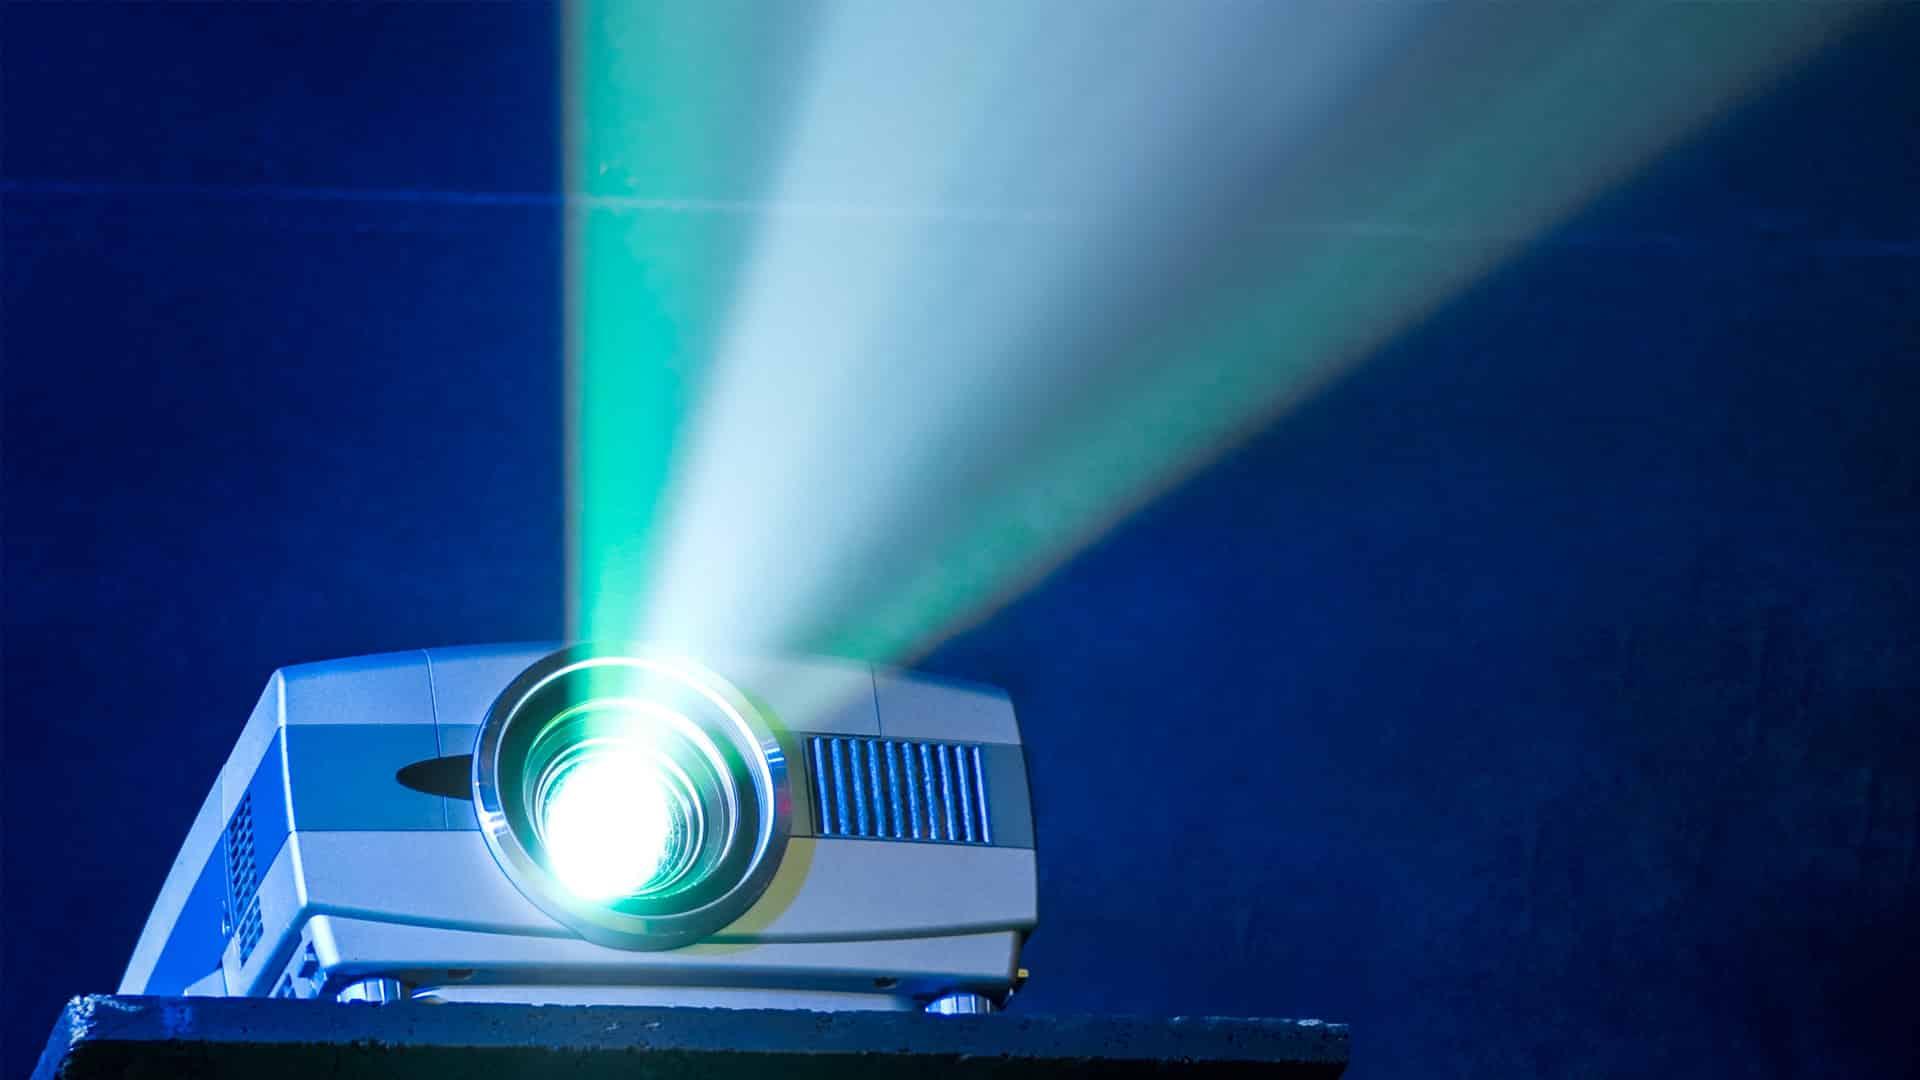 High-Tech Best Portable Projectors